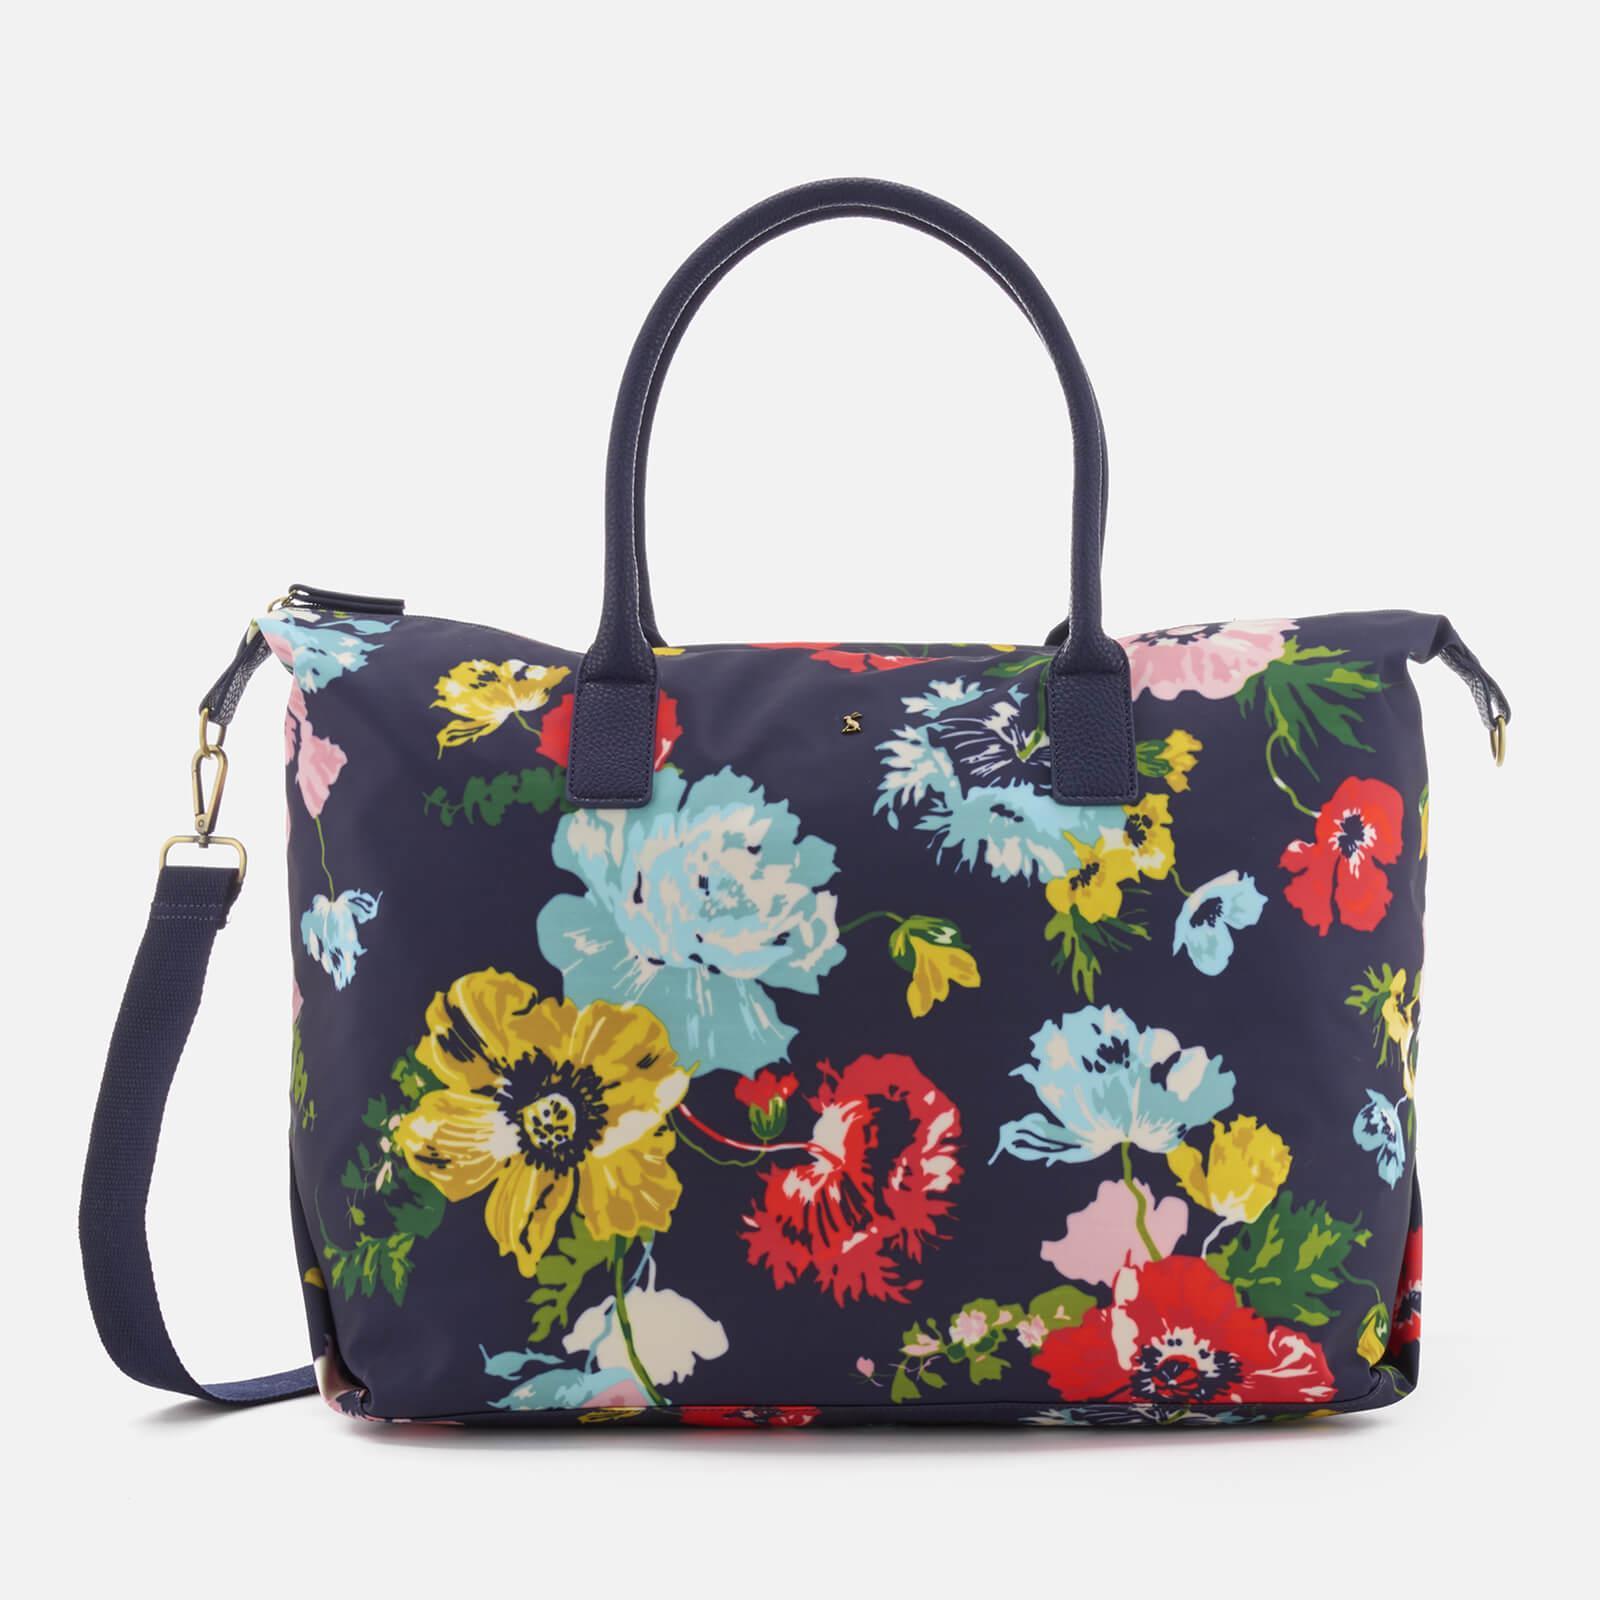 Tenacitee American Grown with Ghanaian Roots Flamingo Raw Edge Canvas Messenger Bag